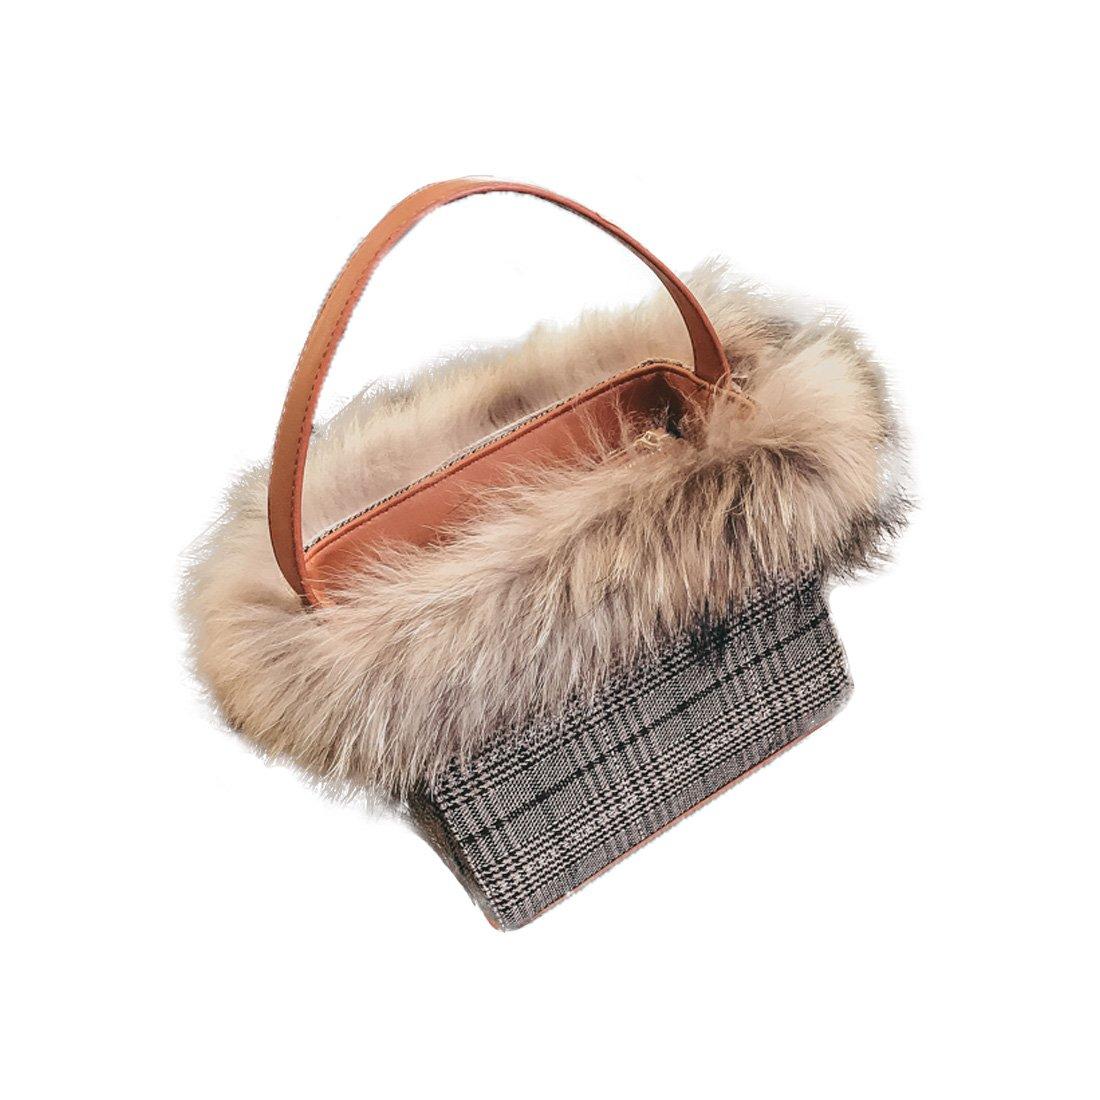 5f3875b1 Fur Handbag Strap